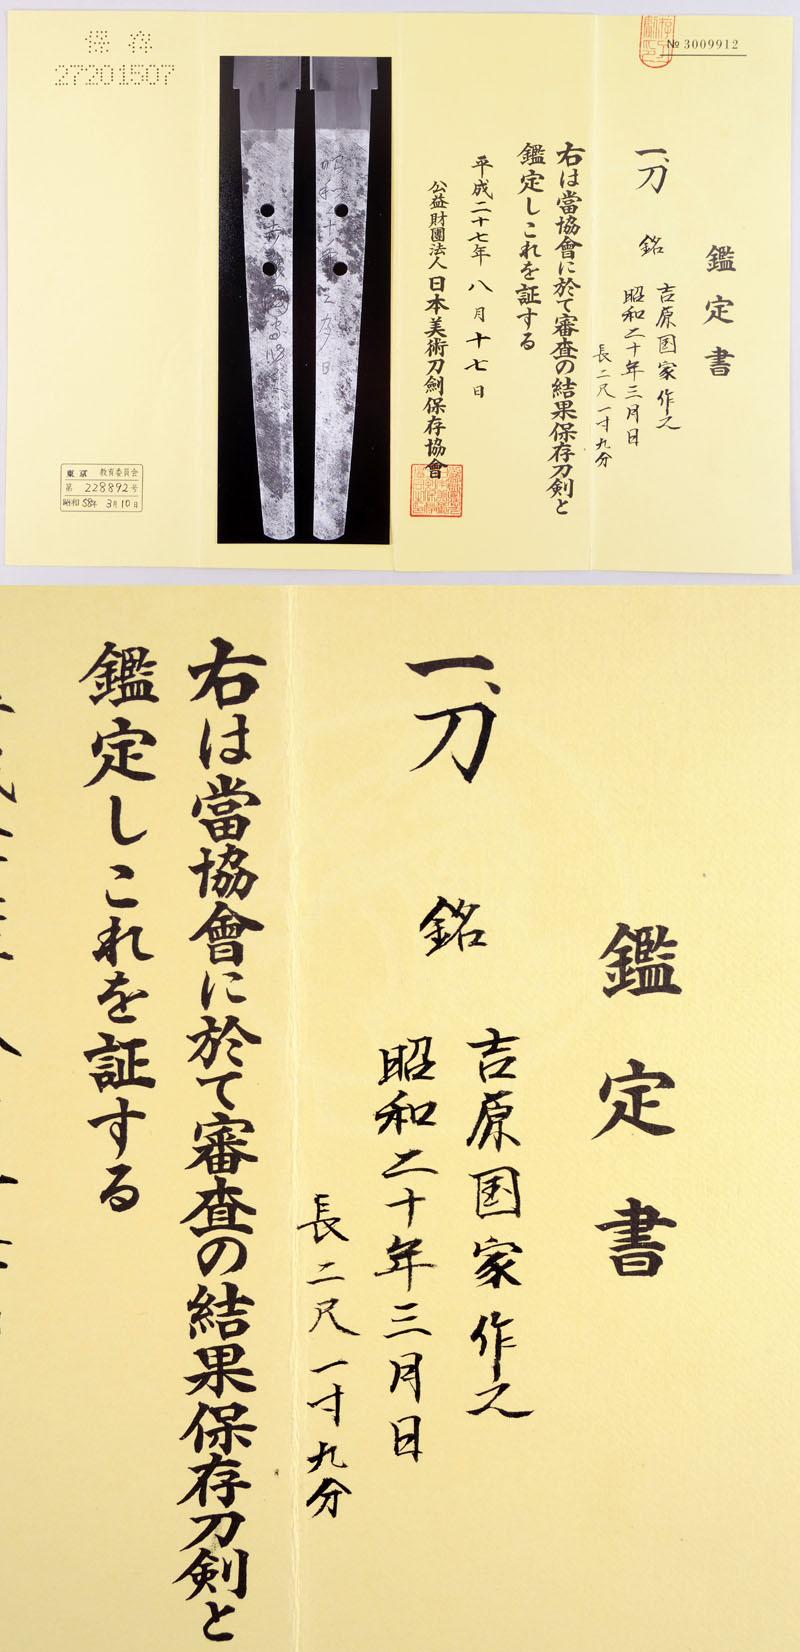 吉原国家作之(初代) Picture of Certificate